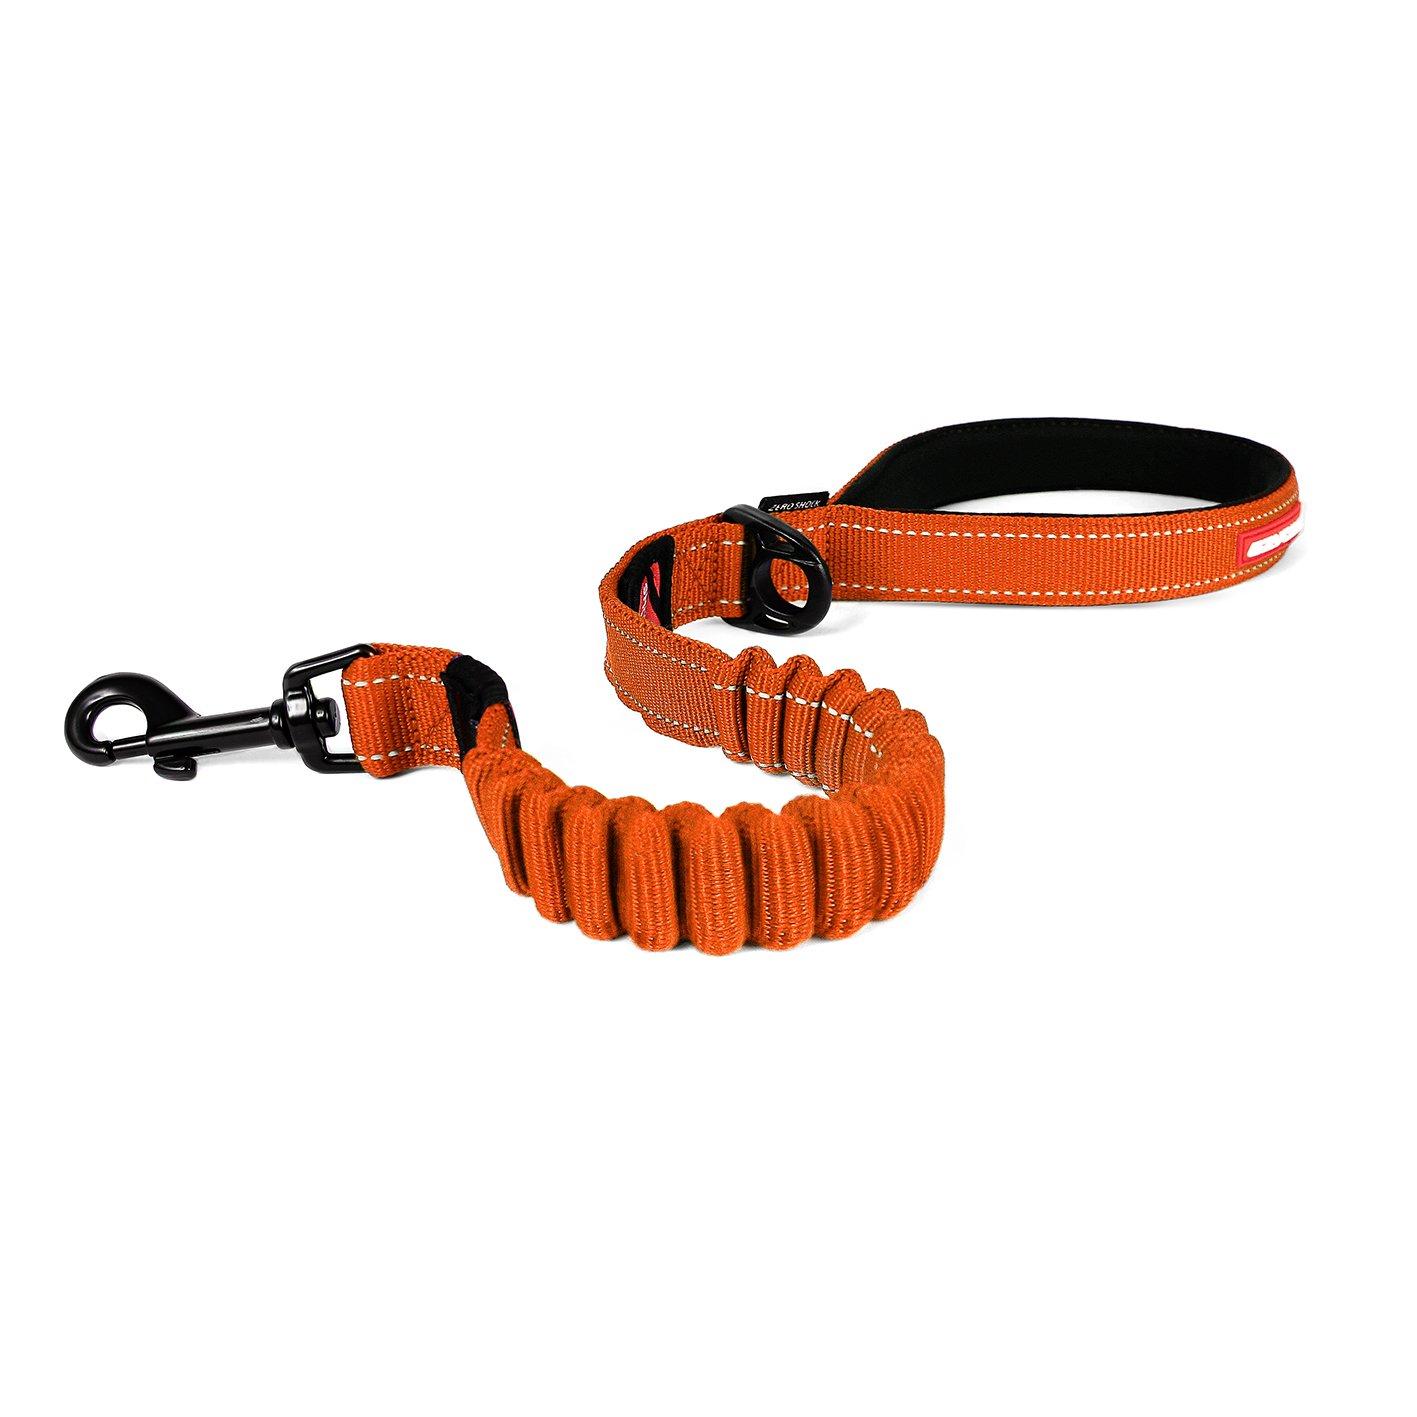 orange 25-Inch orange 25-Inch EzyDog ZERO SHOCK Leash Best Shock Absorbing Dog Leash, Control & Training Lead (25  orange)